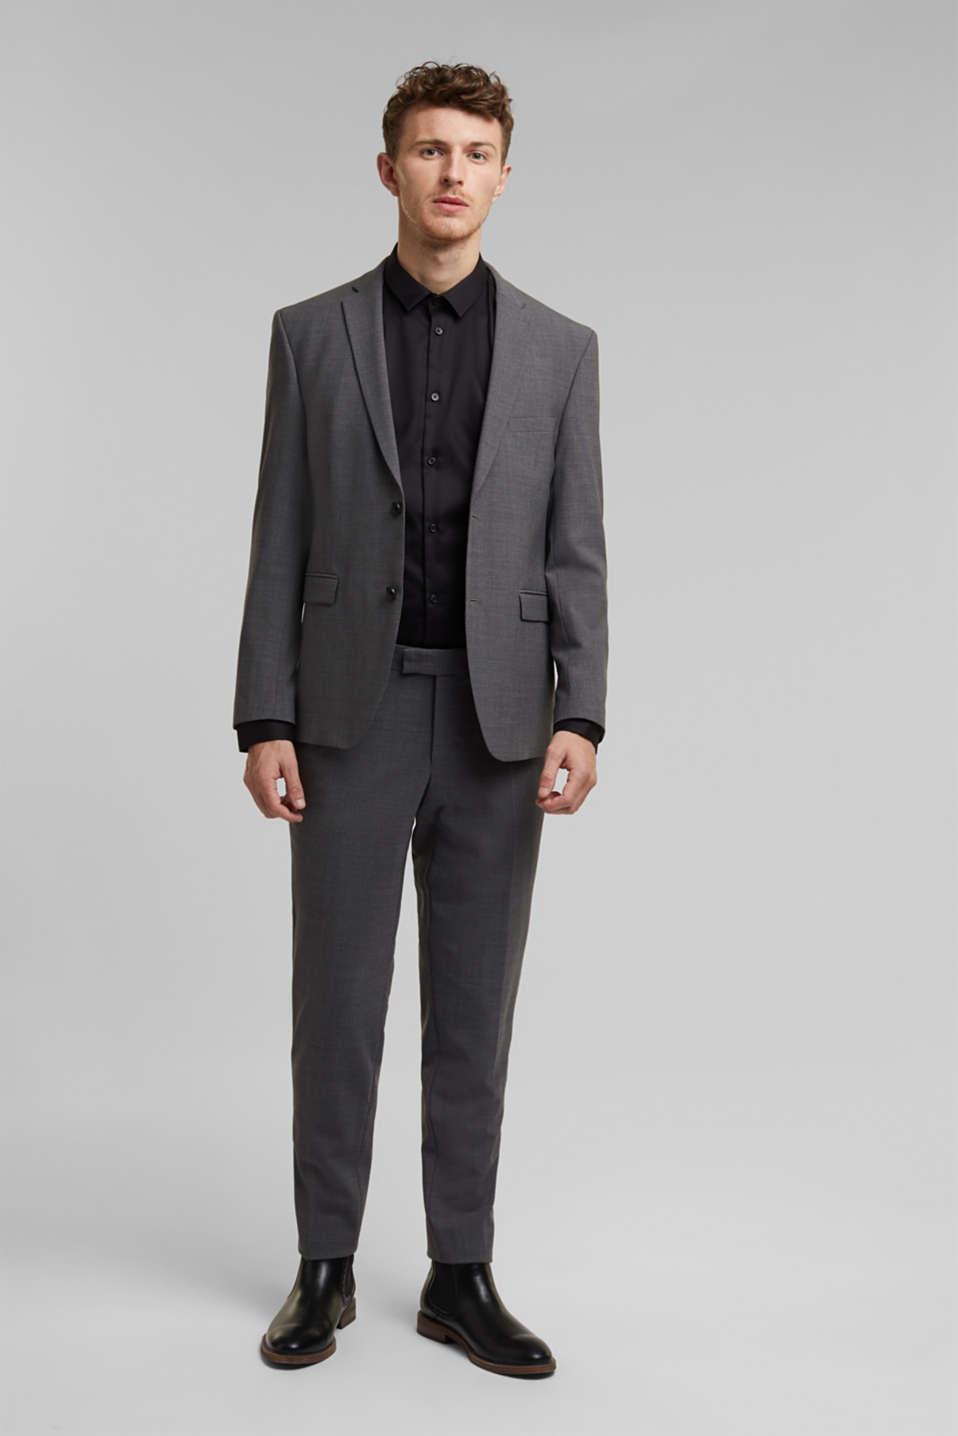 ACTIVE SUIT tailored jacket, wool blend, DARK GREY 5, detail image number 1